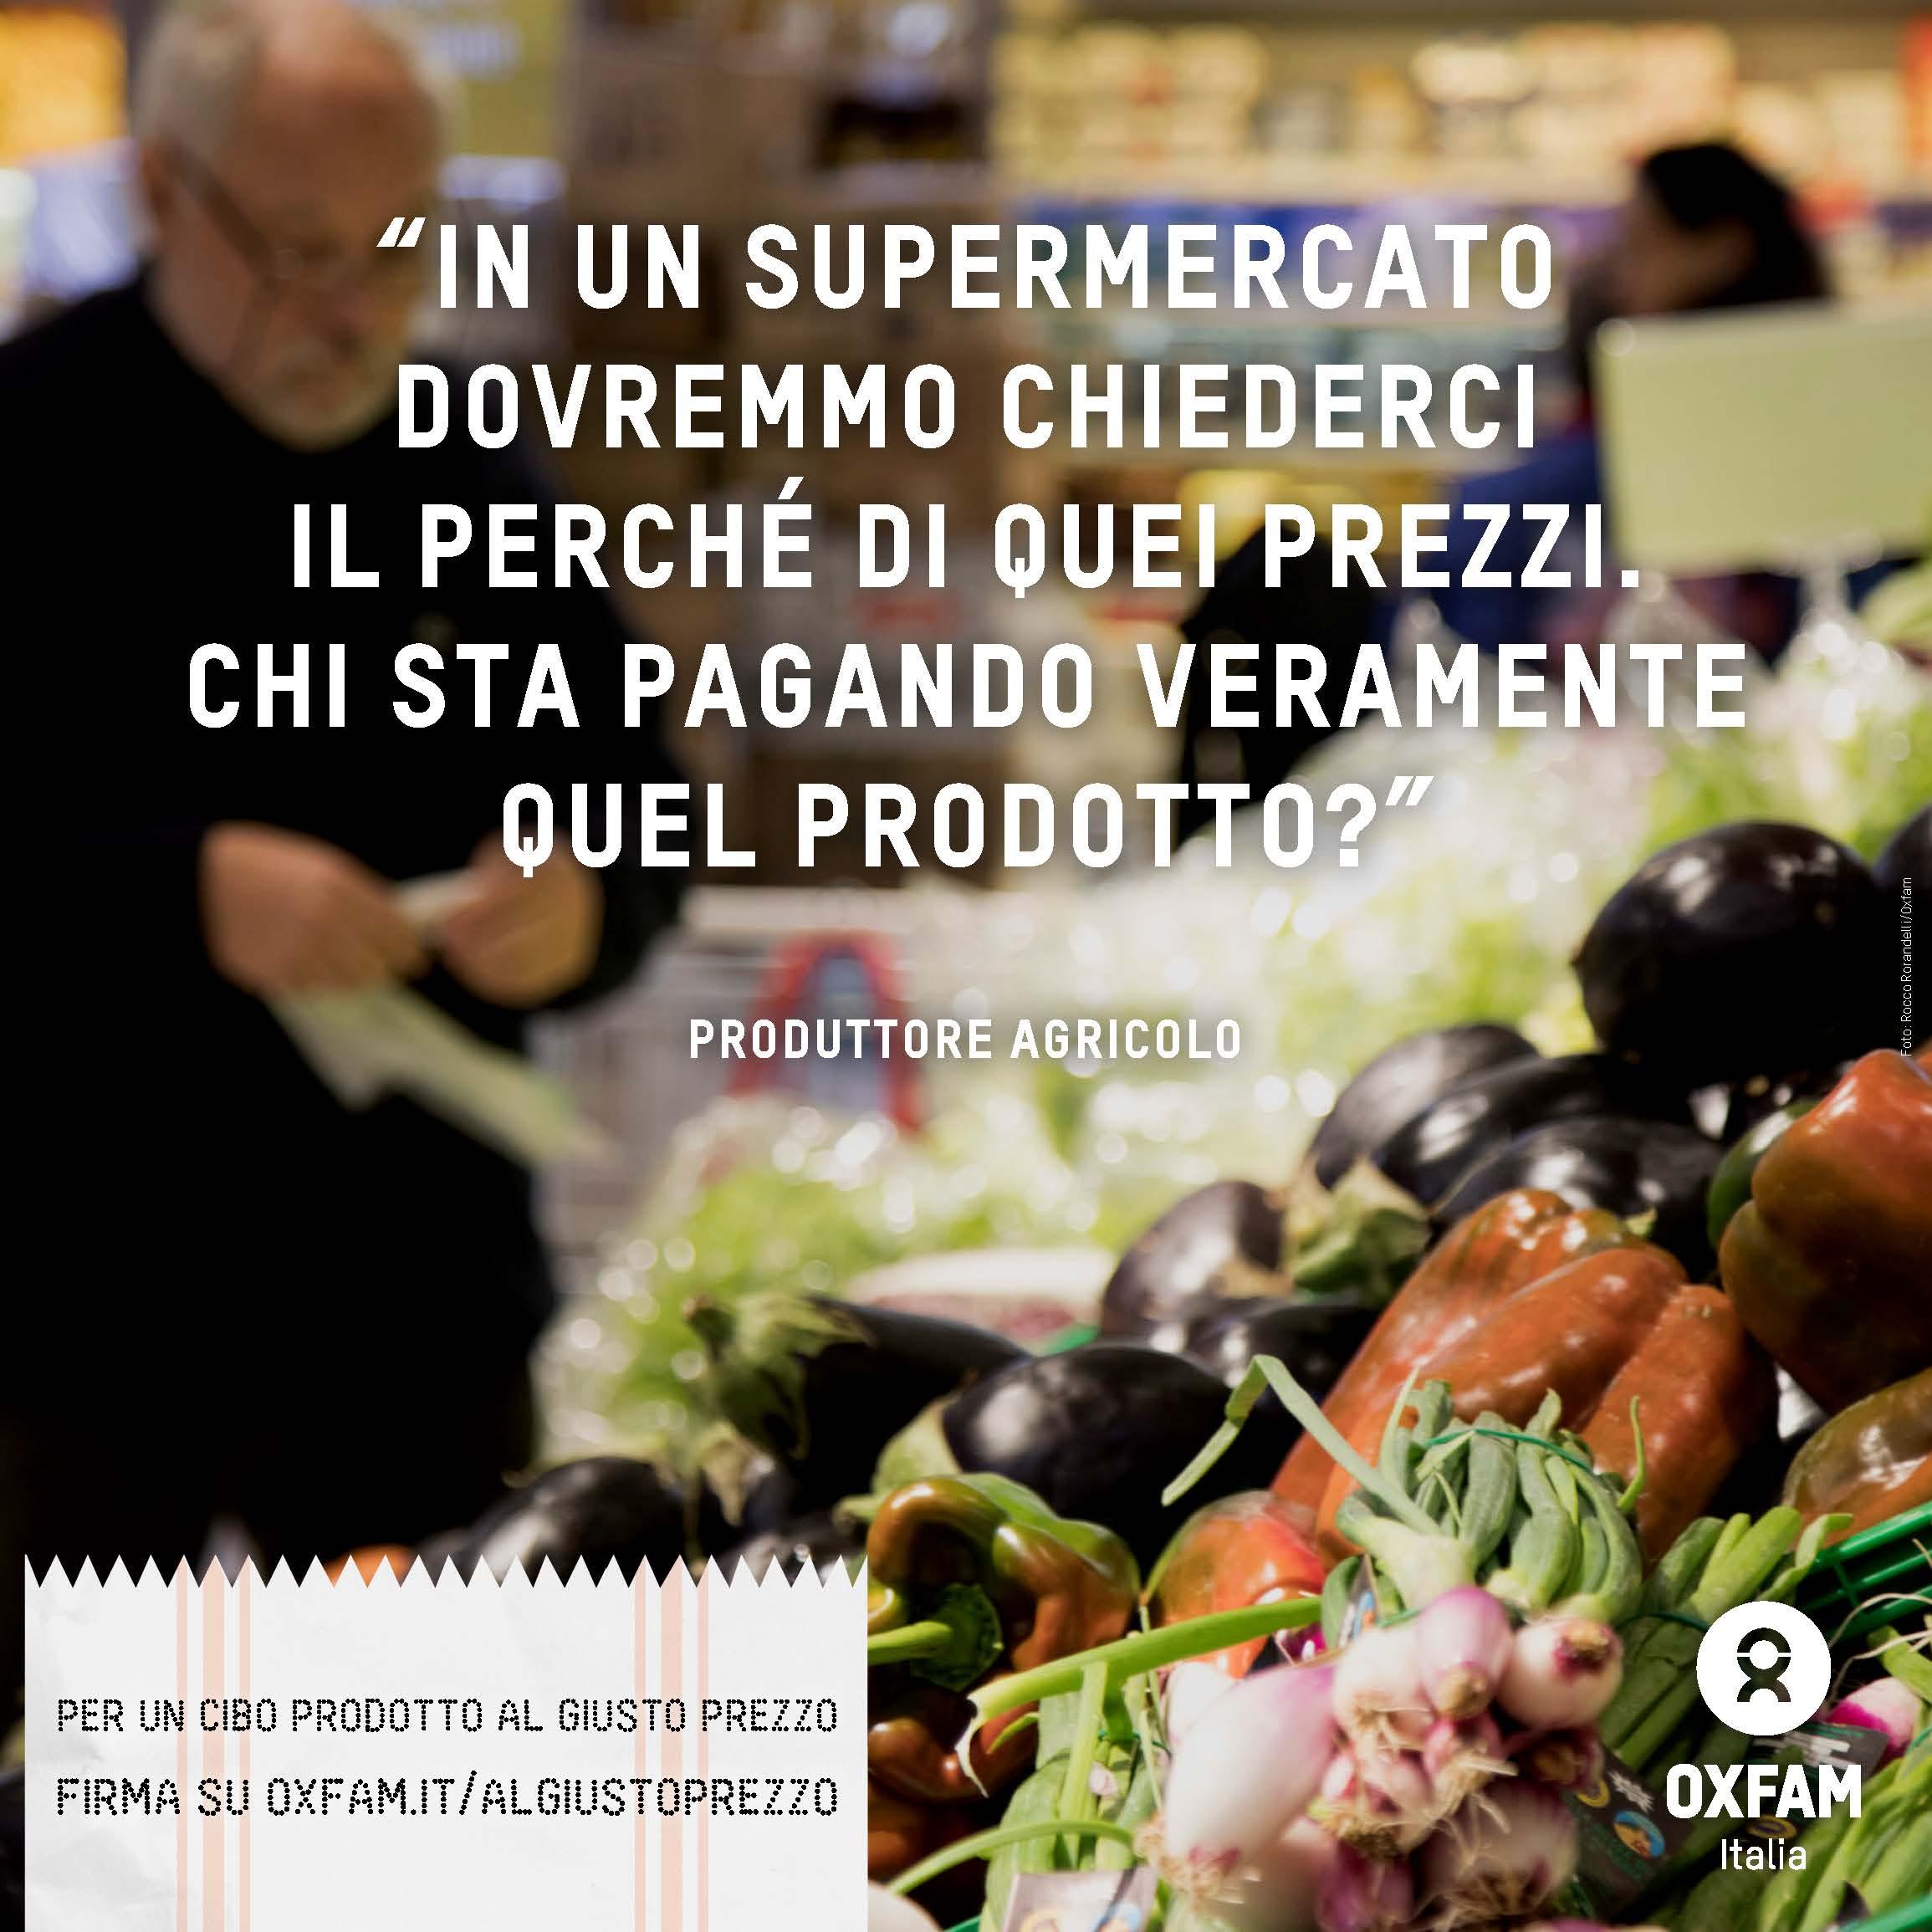 Oxfam indagine Gdo